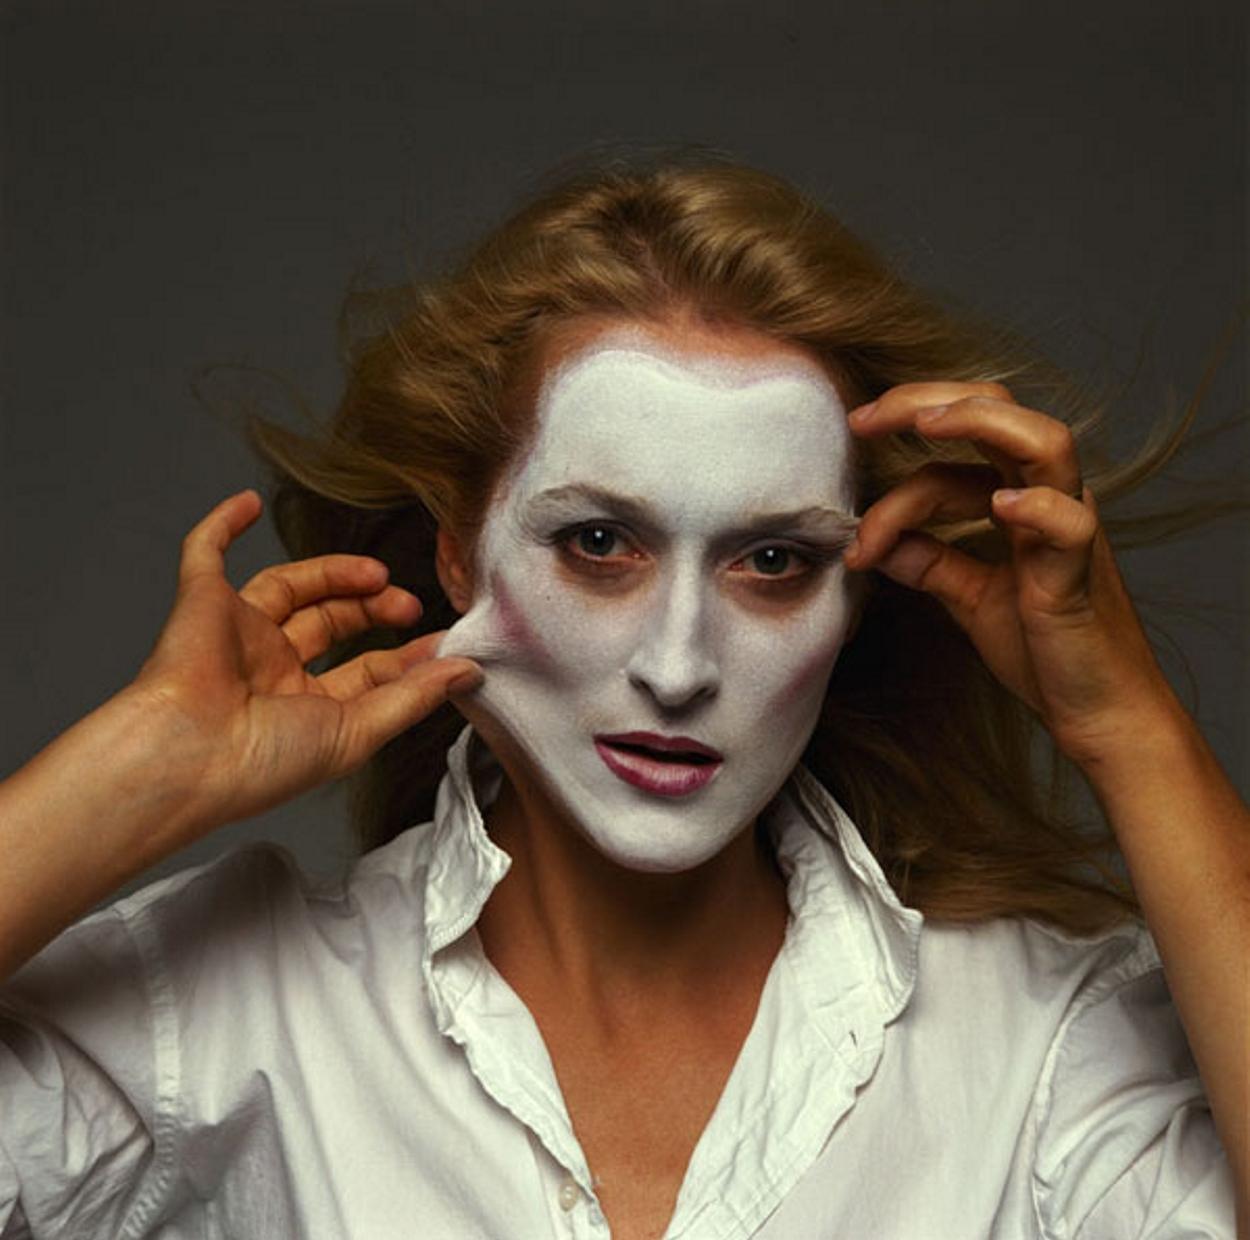 http://2.bp.blogspot.com/_YvWDmJvuRUc/TUg3h5RmOVI/AAAAAAAAABM/Jbhf6uF5wbg/s1600/Meryl+Streep.jpg